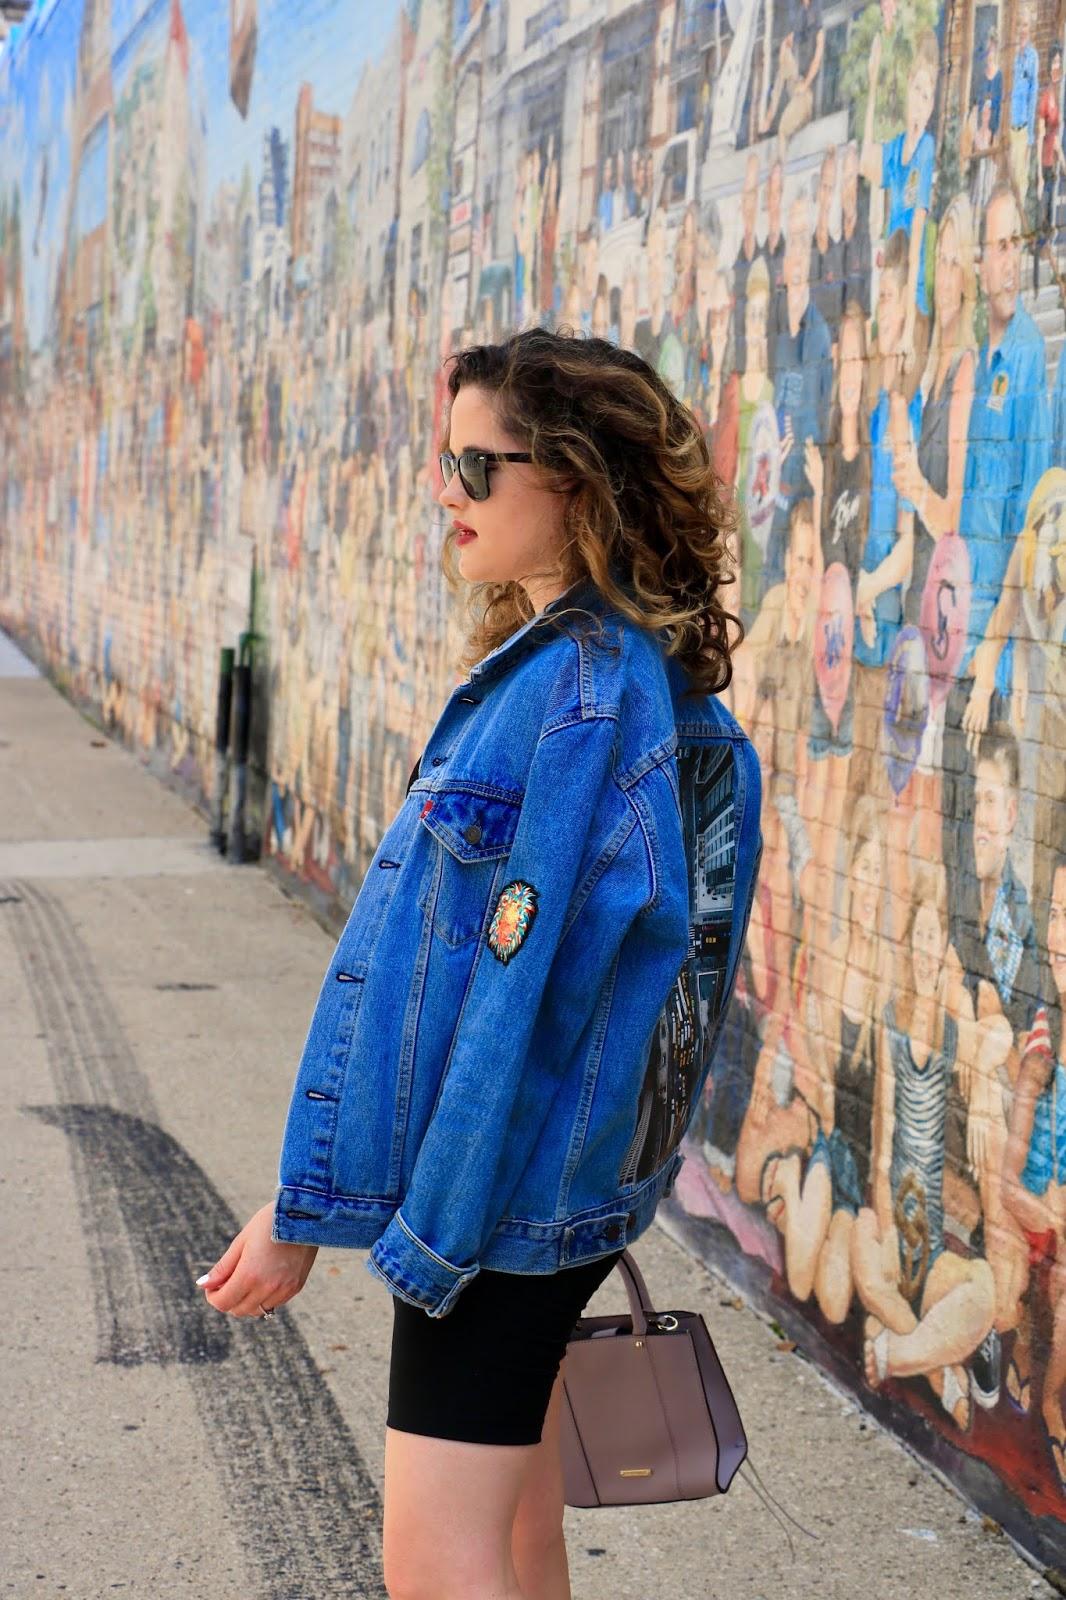 NYC fashion blogger Kathleen Harper's 2019 fall fashion ideas.